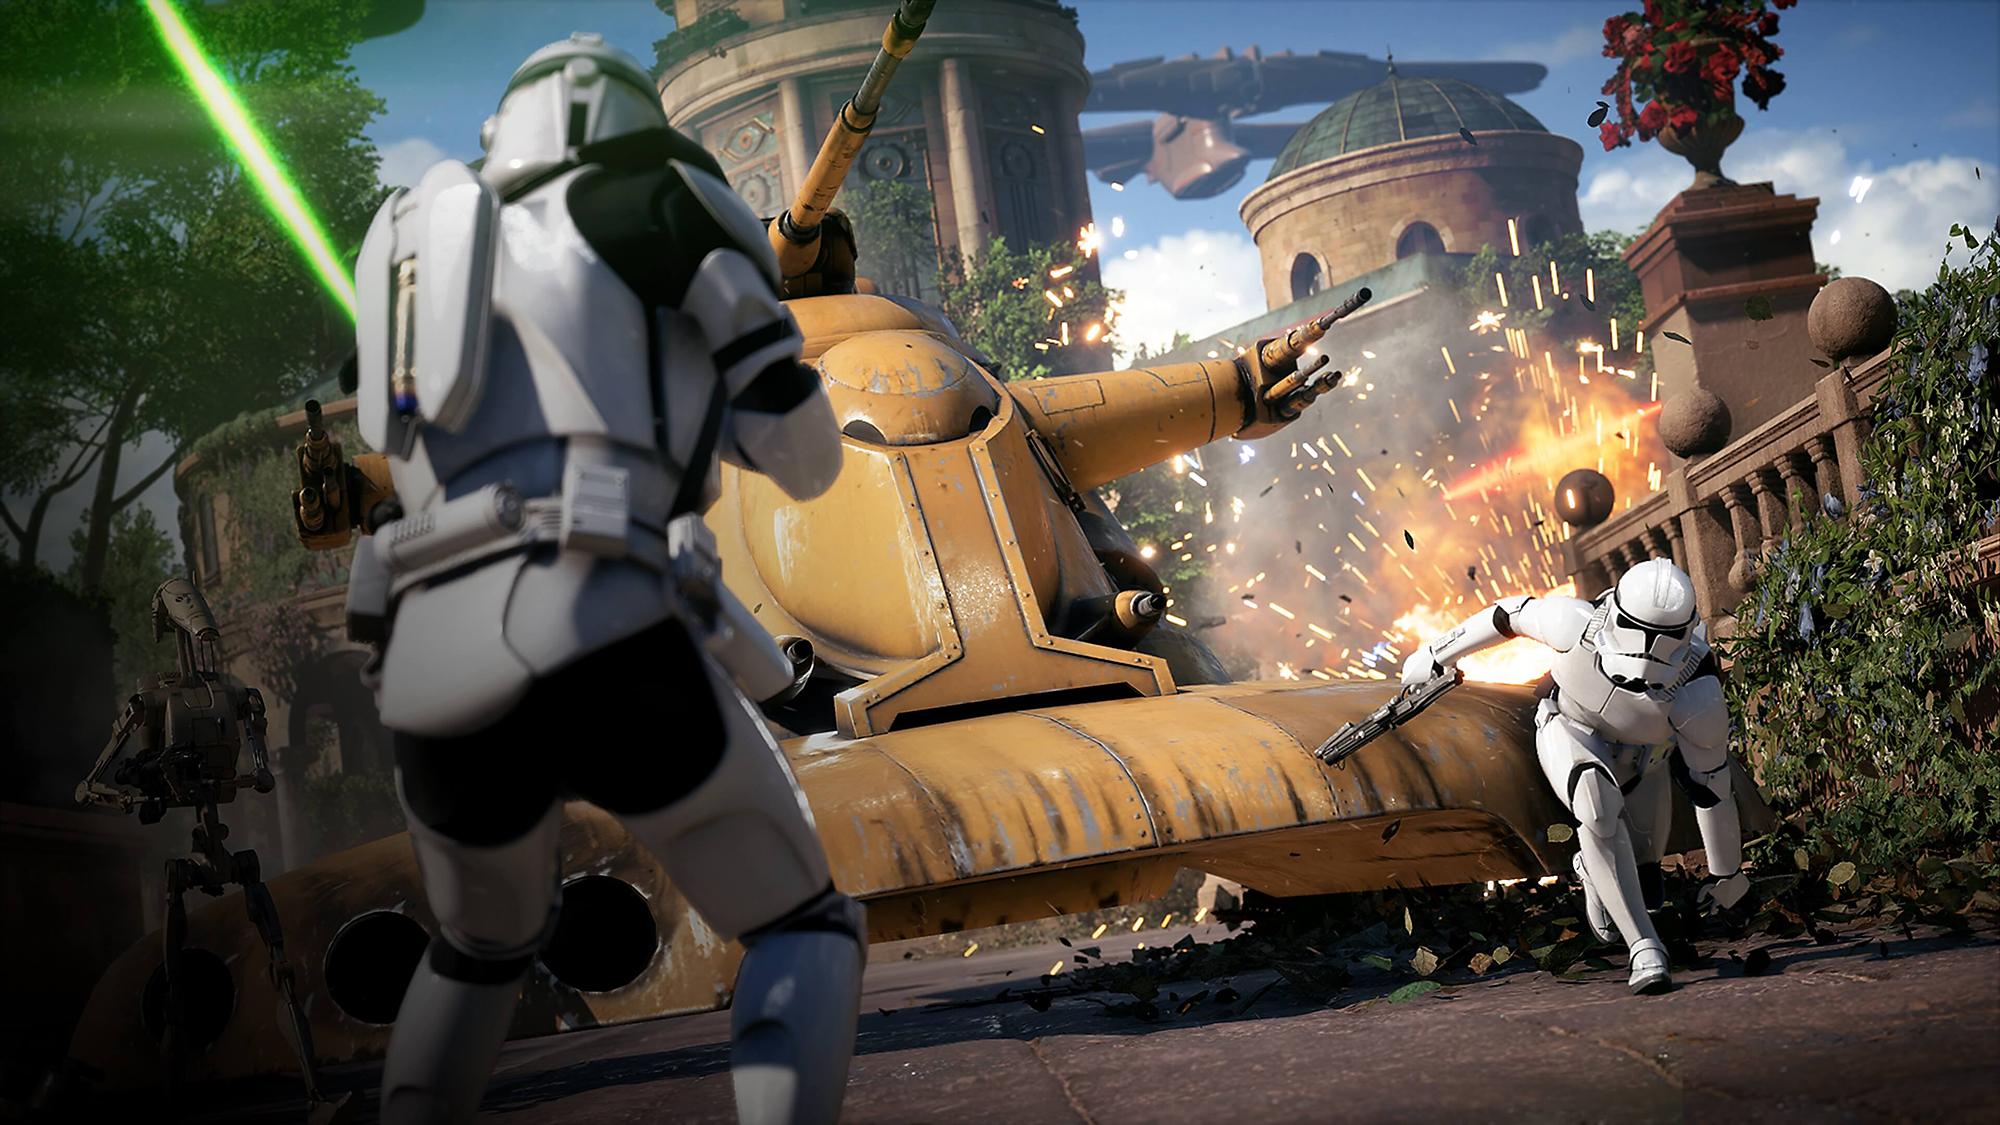 star wars battlefront 7 minutes of gameplay